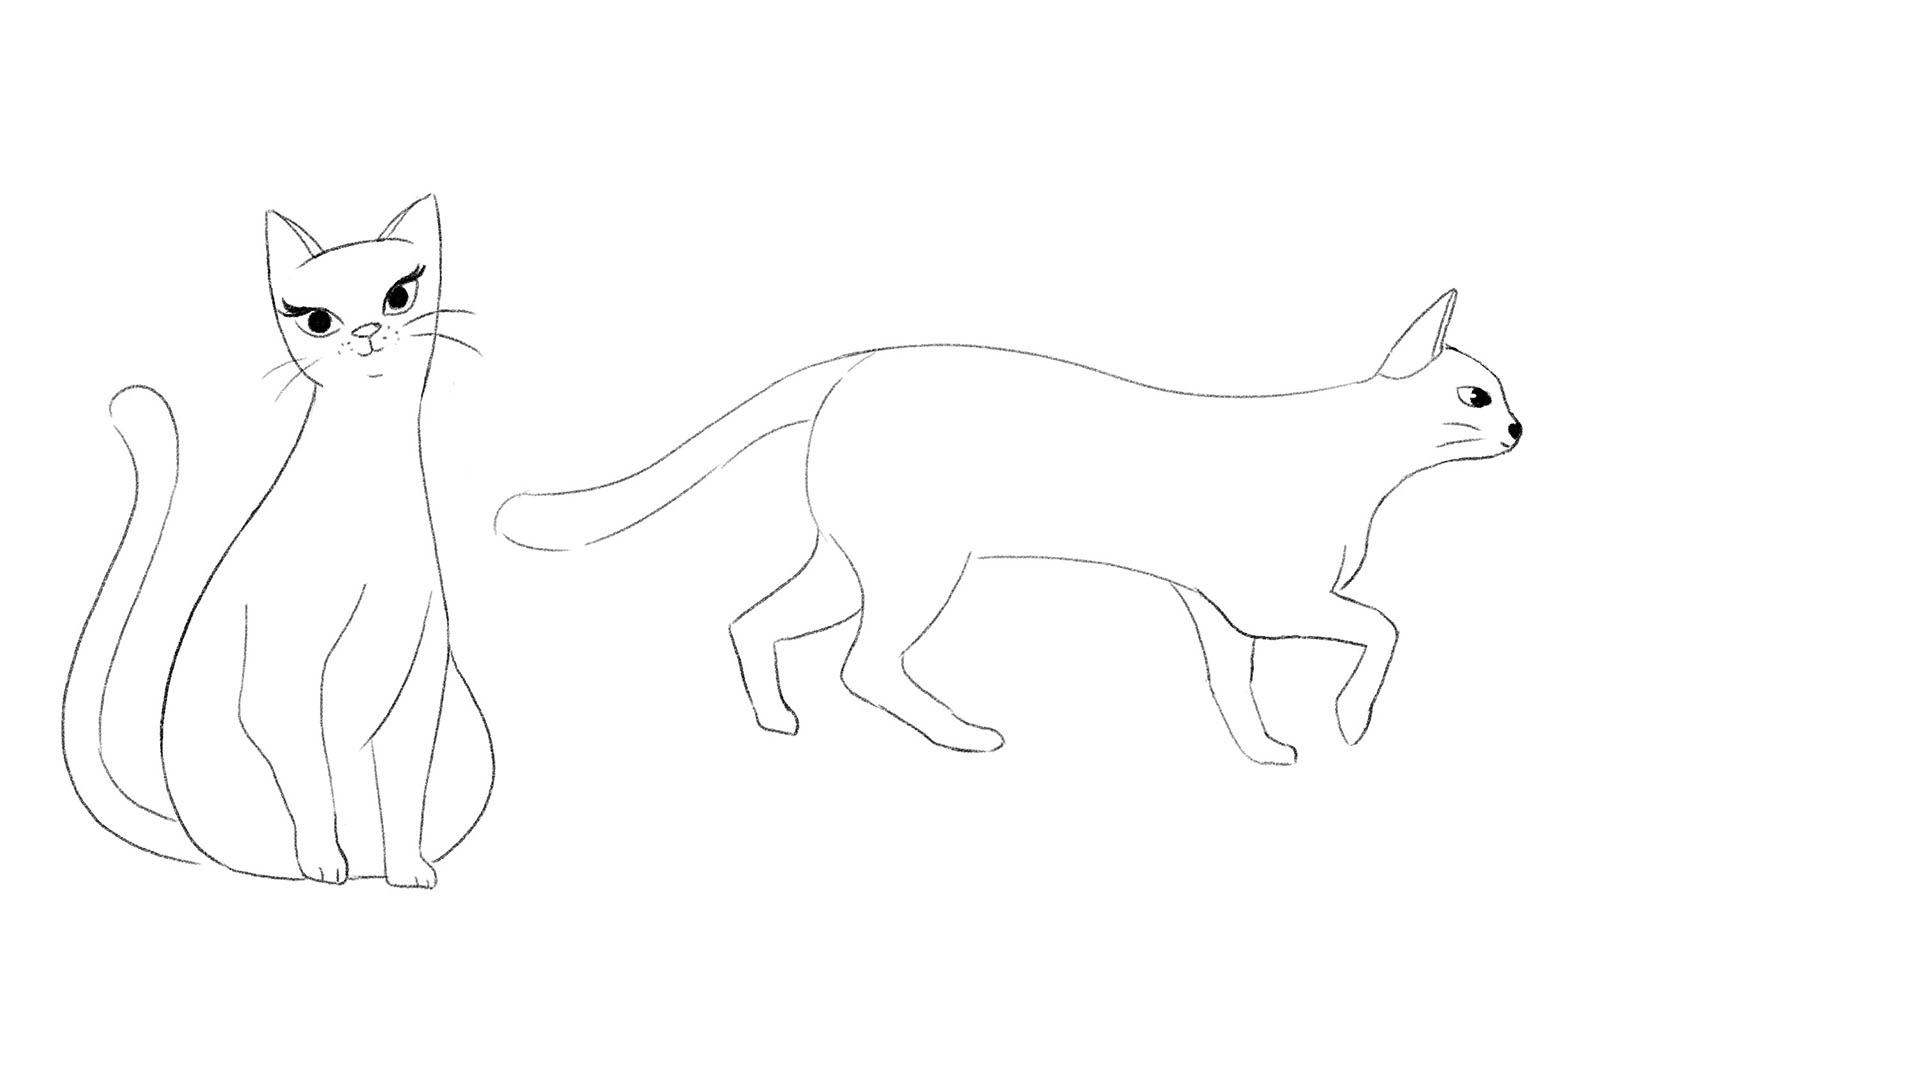 Chickflia_cat sketch_v01_b.jpg